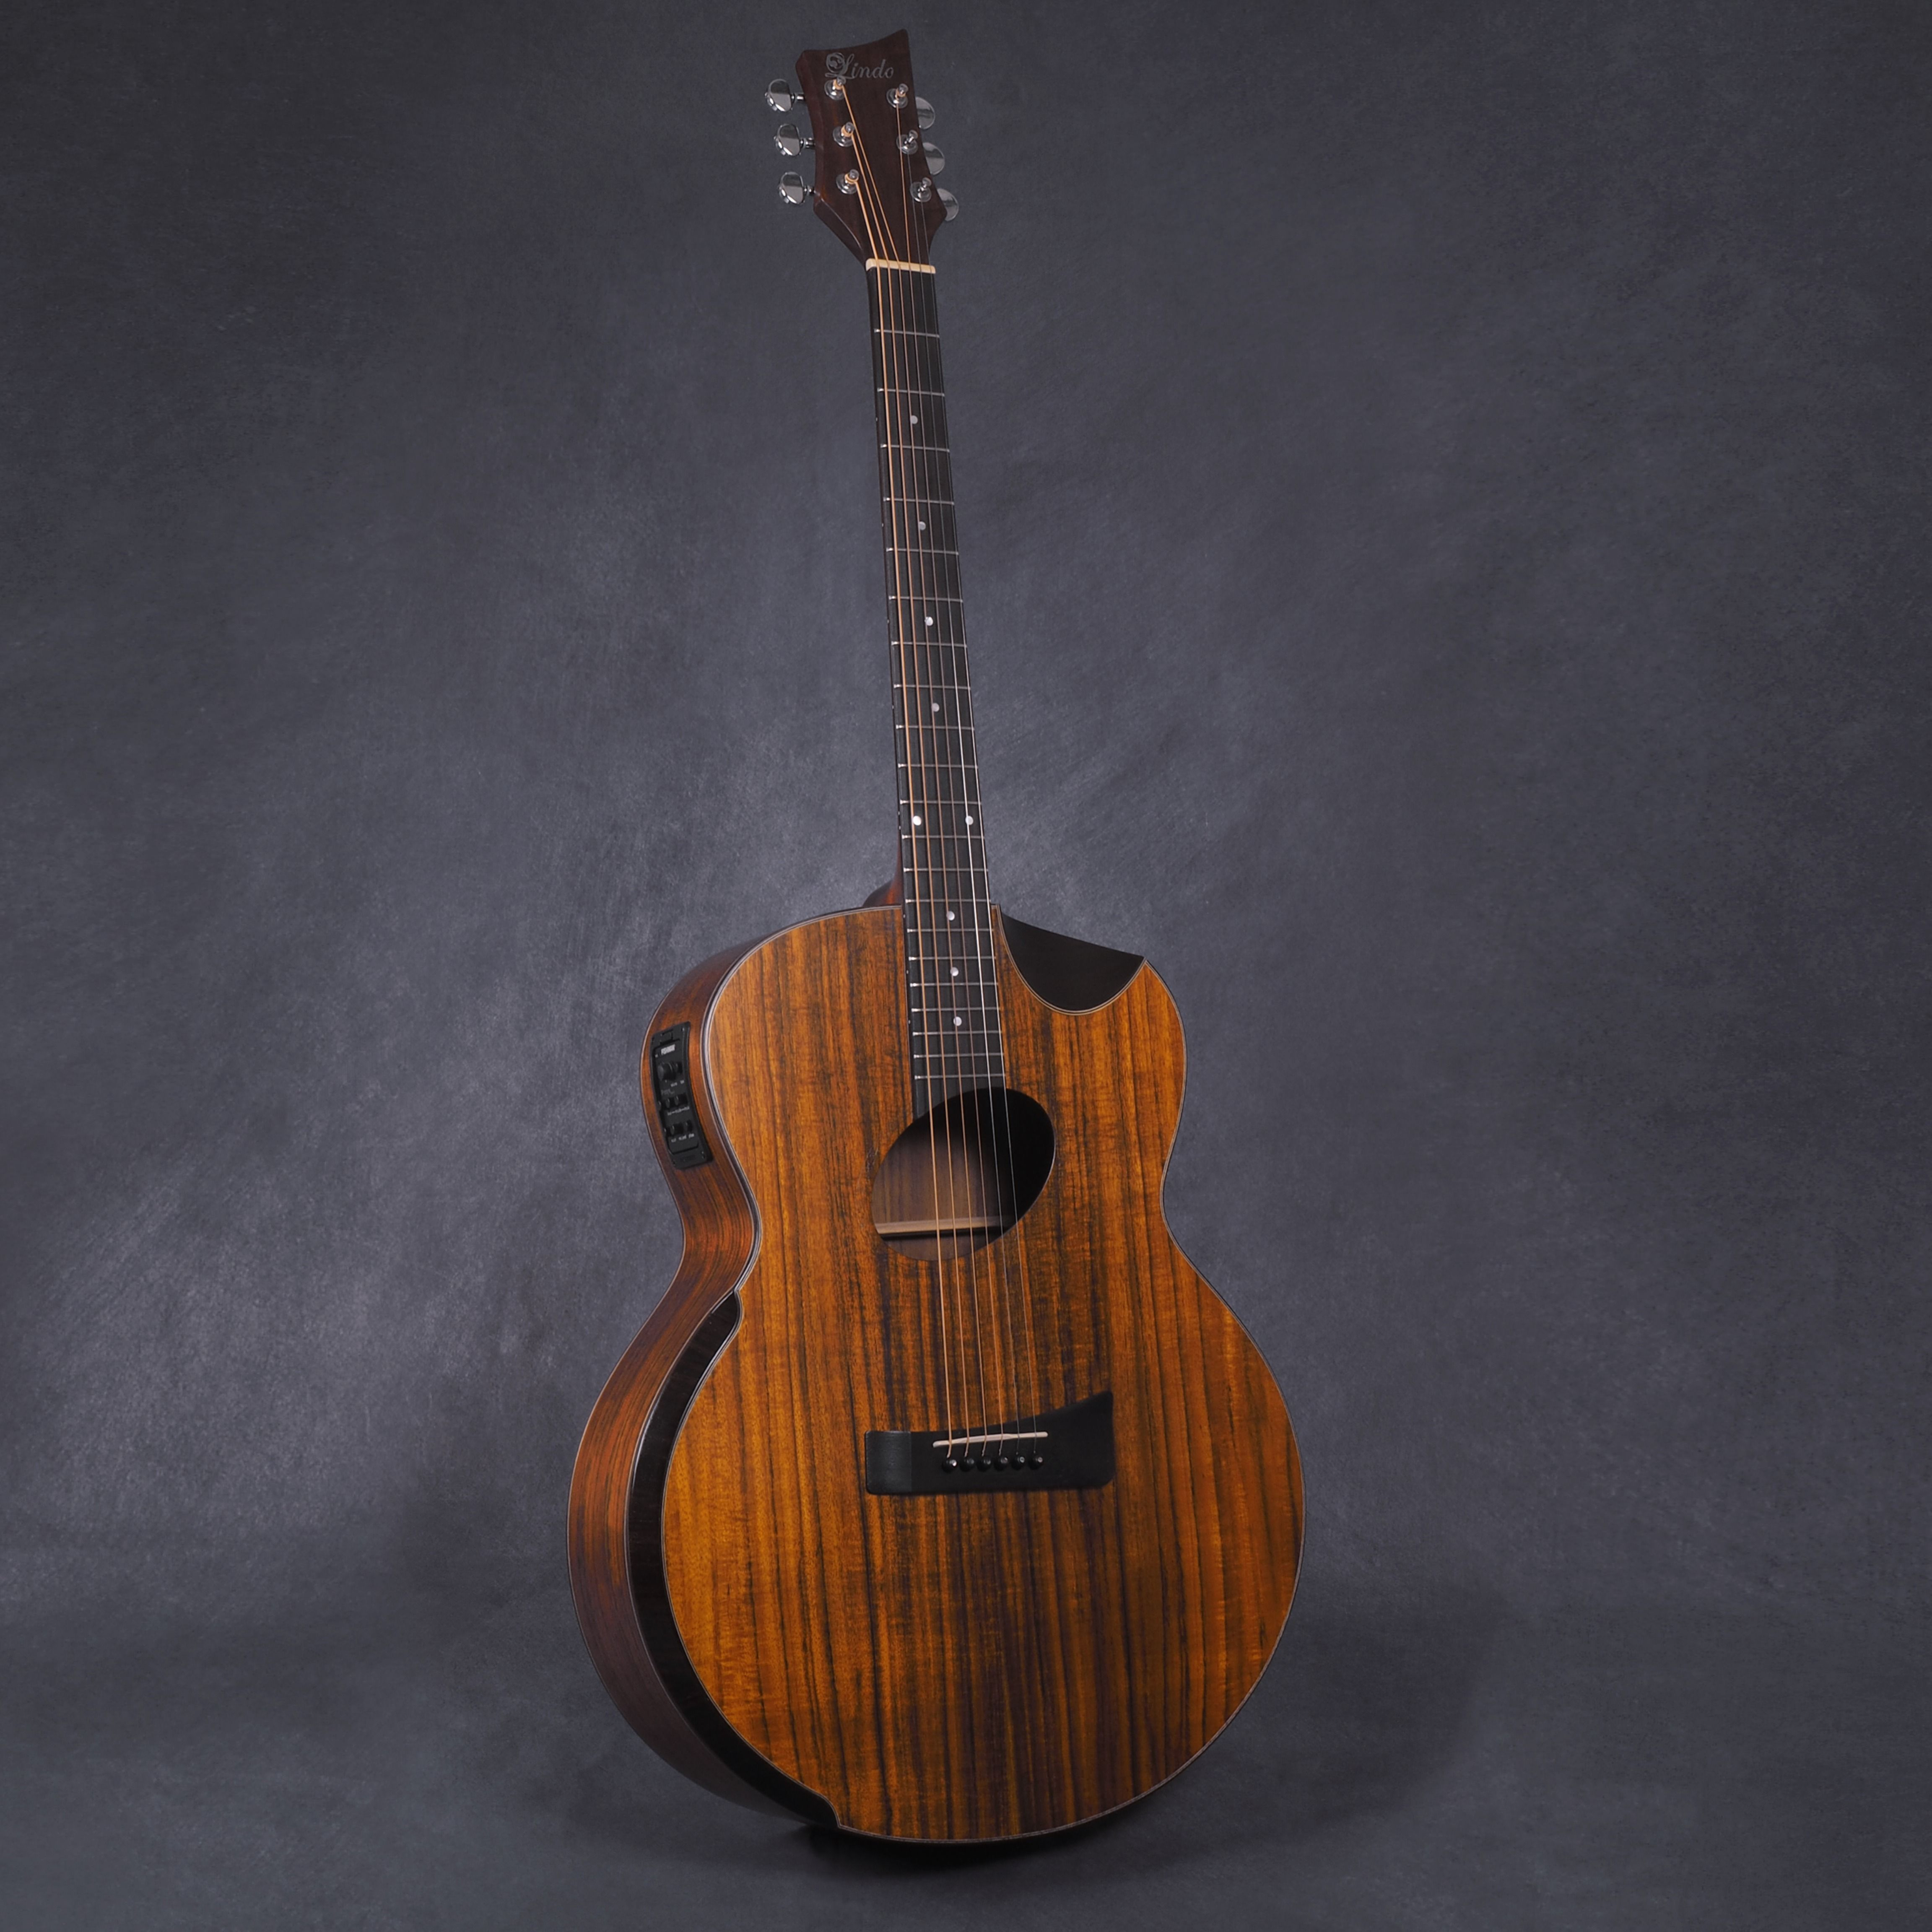 Pin On Guitars Strings More